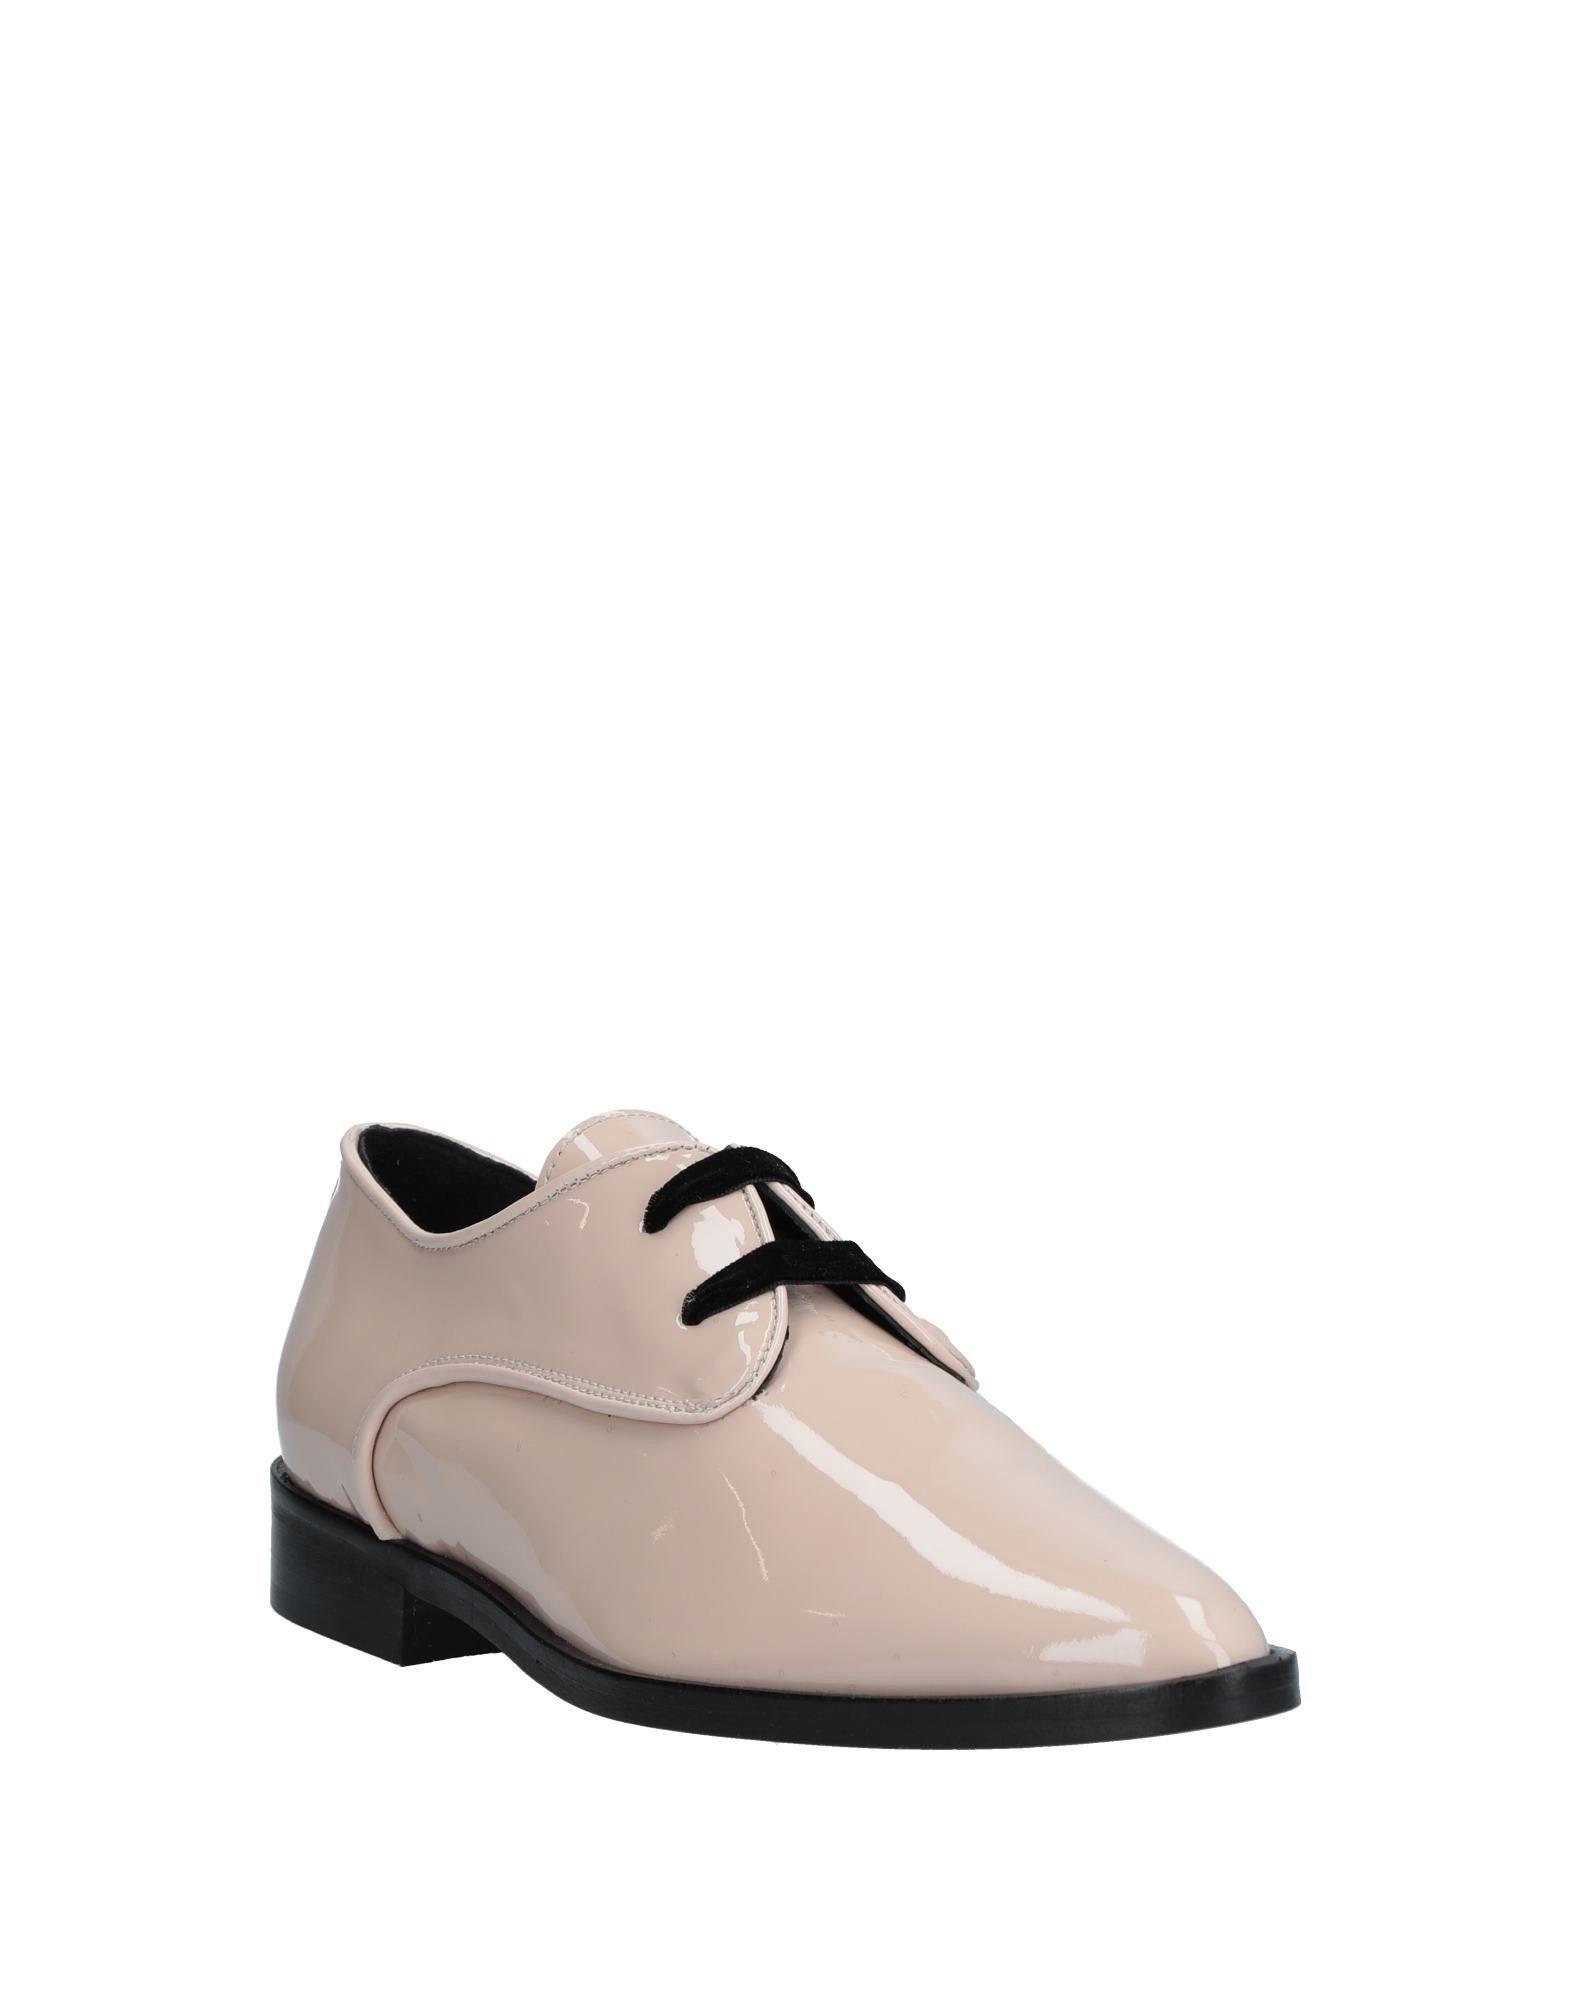 Maison Shoeshibar Schnürschuhe Damen Damen Damen  11537094WU f467ba